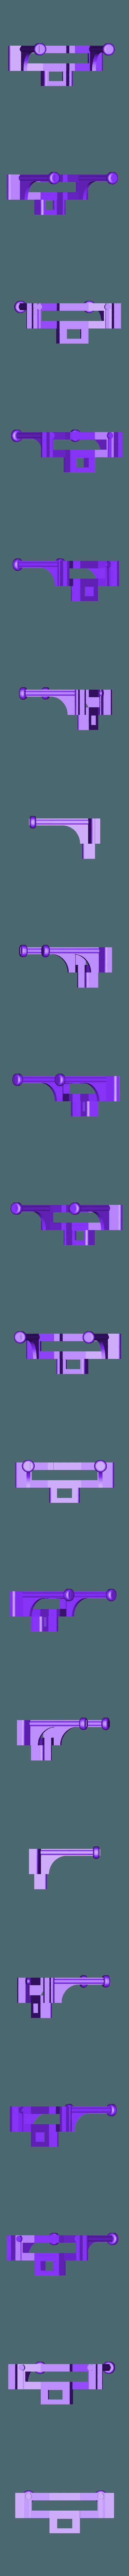 fufu2.stl Download free STL file Small Humanoid Robot • 3D printable design, choimoni